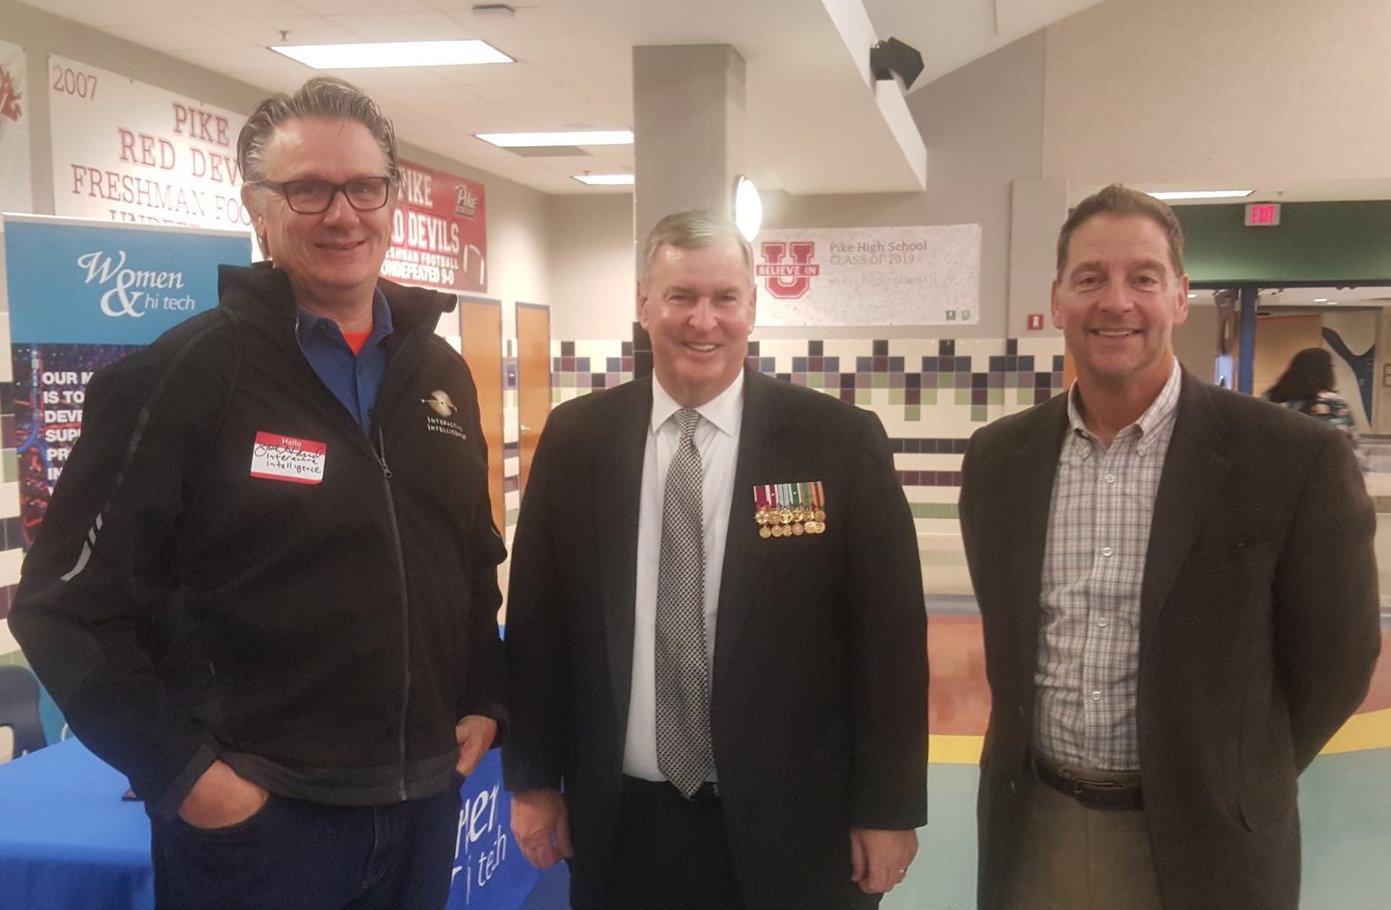 Joe Hand of Interactive Intelligence, former Mayor Greg Ballard, and Warren Lenard of Finish Line were three of the panelists.